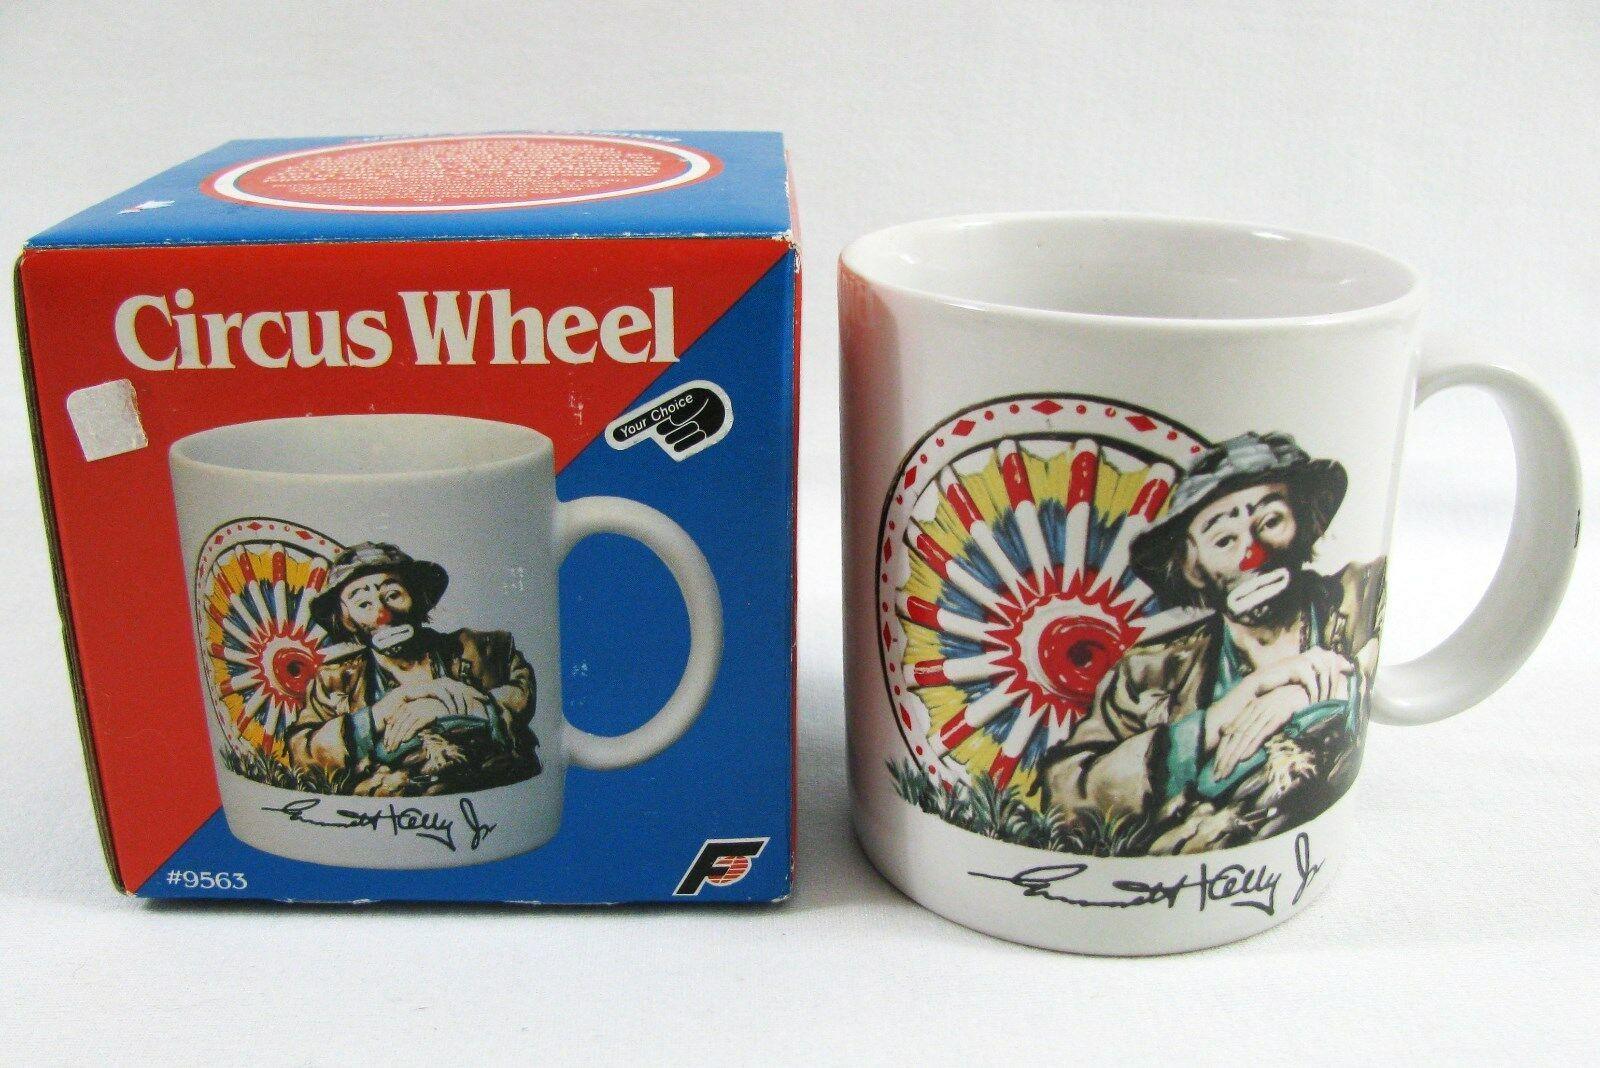 VTG EMMETT KELLY JR  Coffee Mug Clown Circus Ferris Wheel Ceramic FLAMBRO 1987 - $9.89